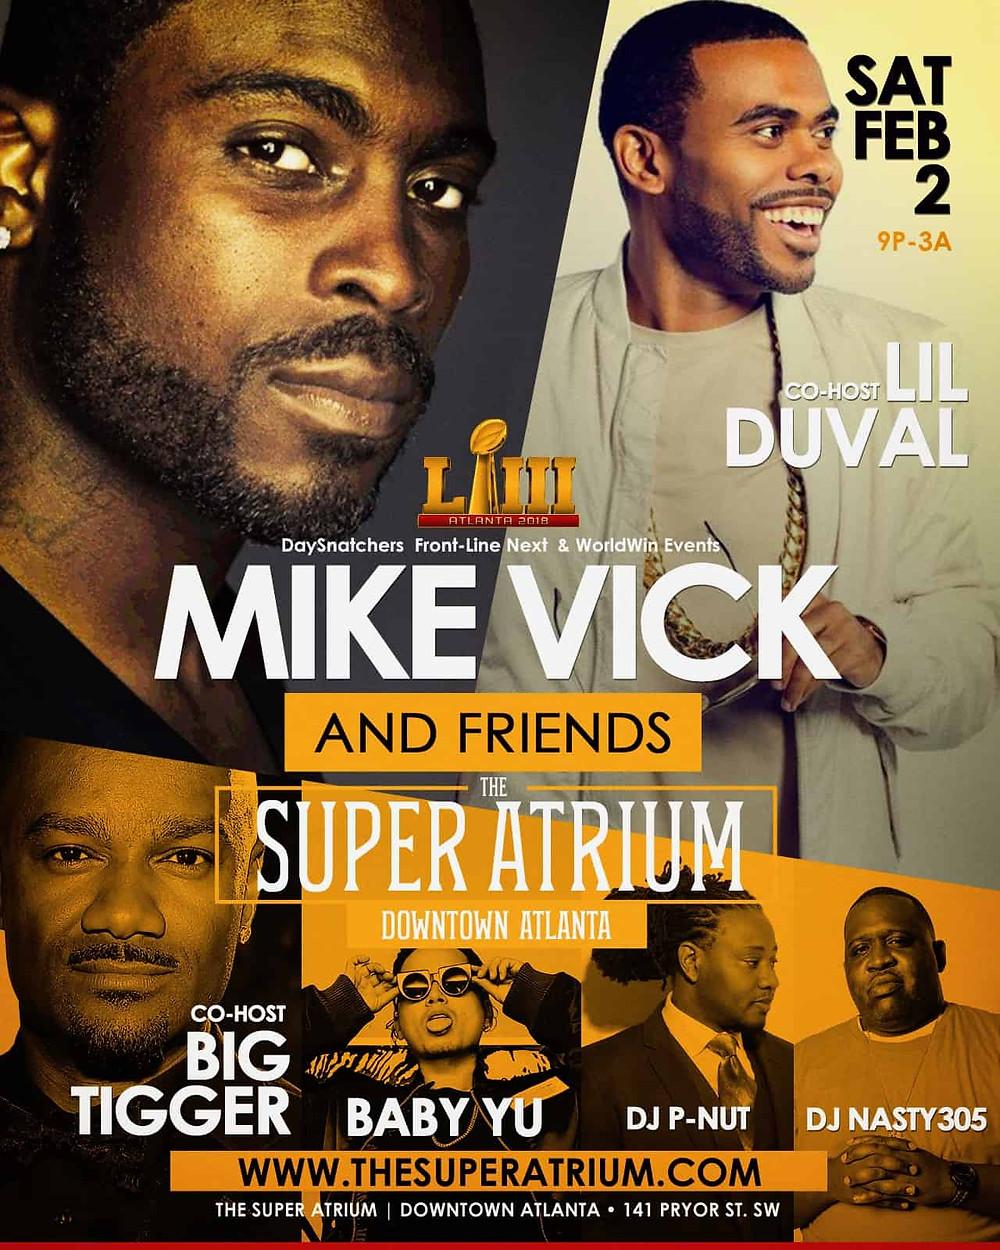 Mike Vick, Lil Duval & Friends Super Bowl Saturday W/Big Tigger At The Super Atrium – Atlanta, GA